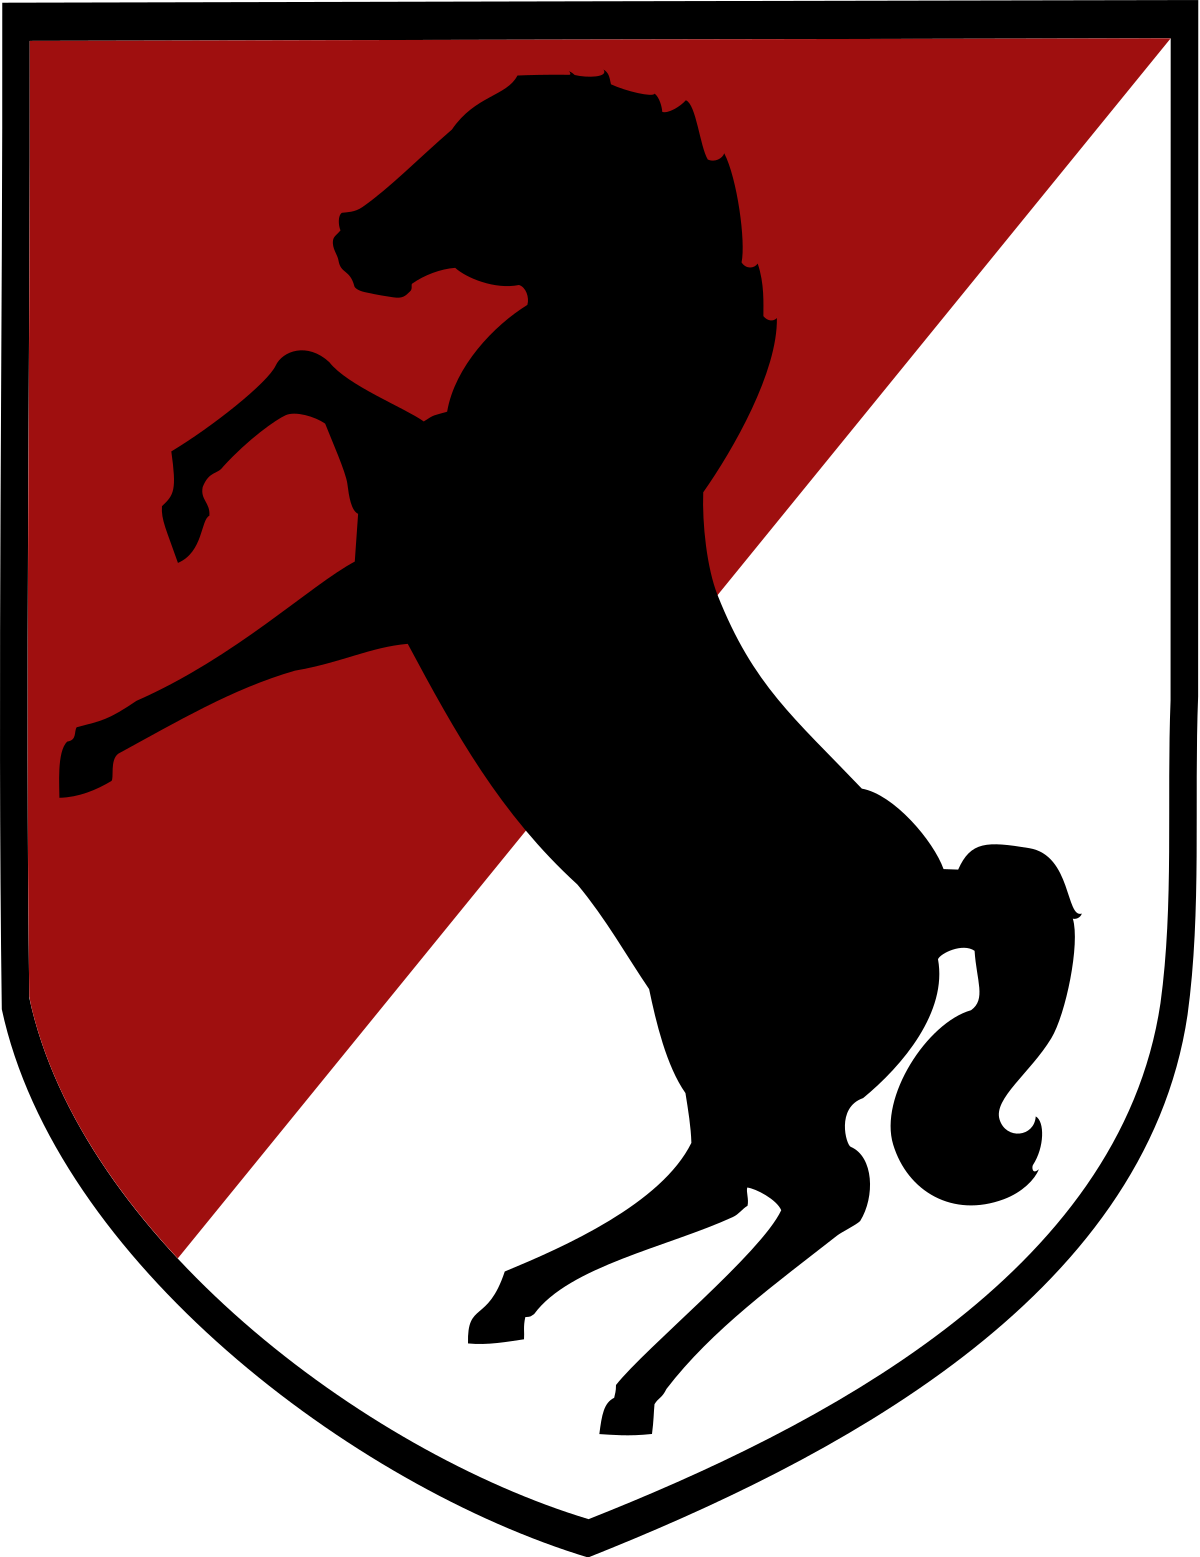 Vietnam 66-67 helmet clipart clip freeuse 11th Armored Cavalry Regiment - Wikipedia clip freeuse